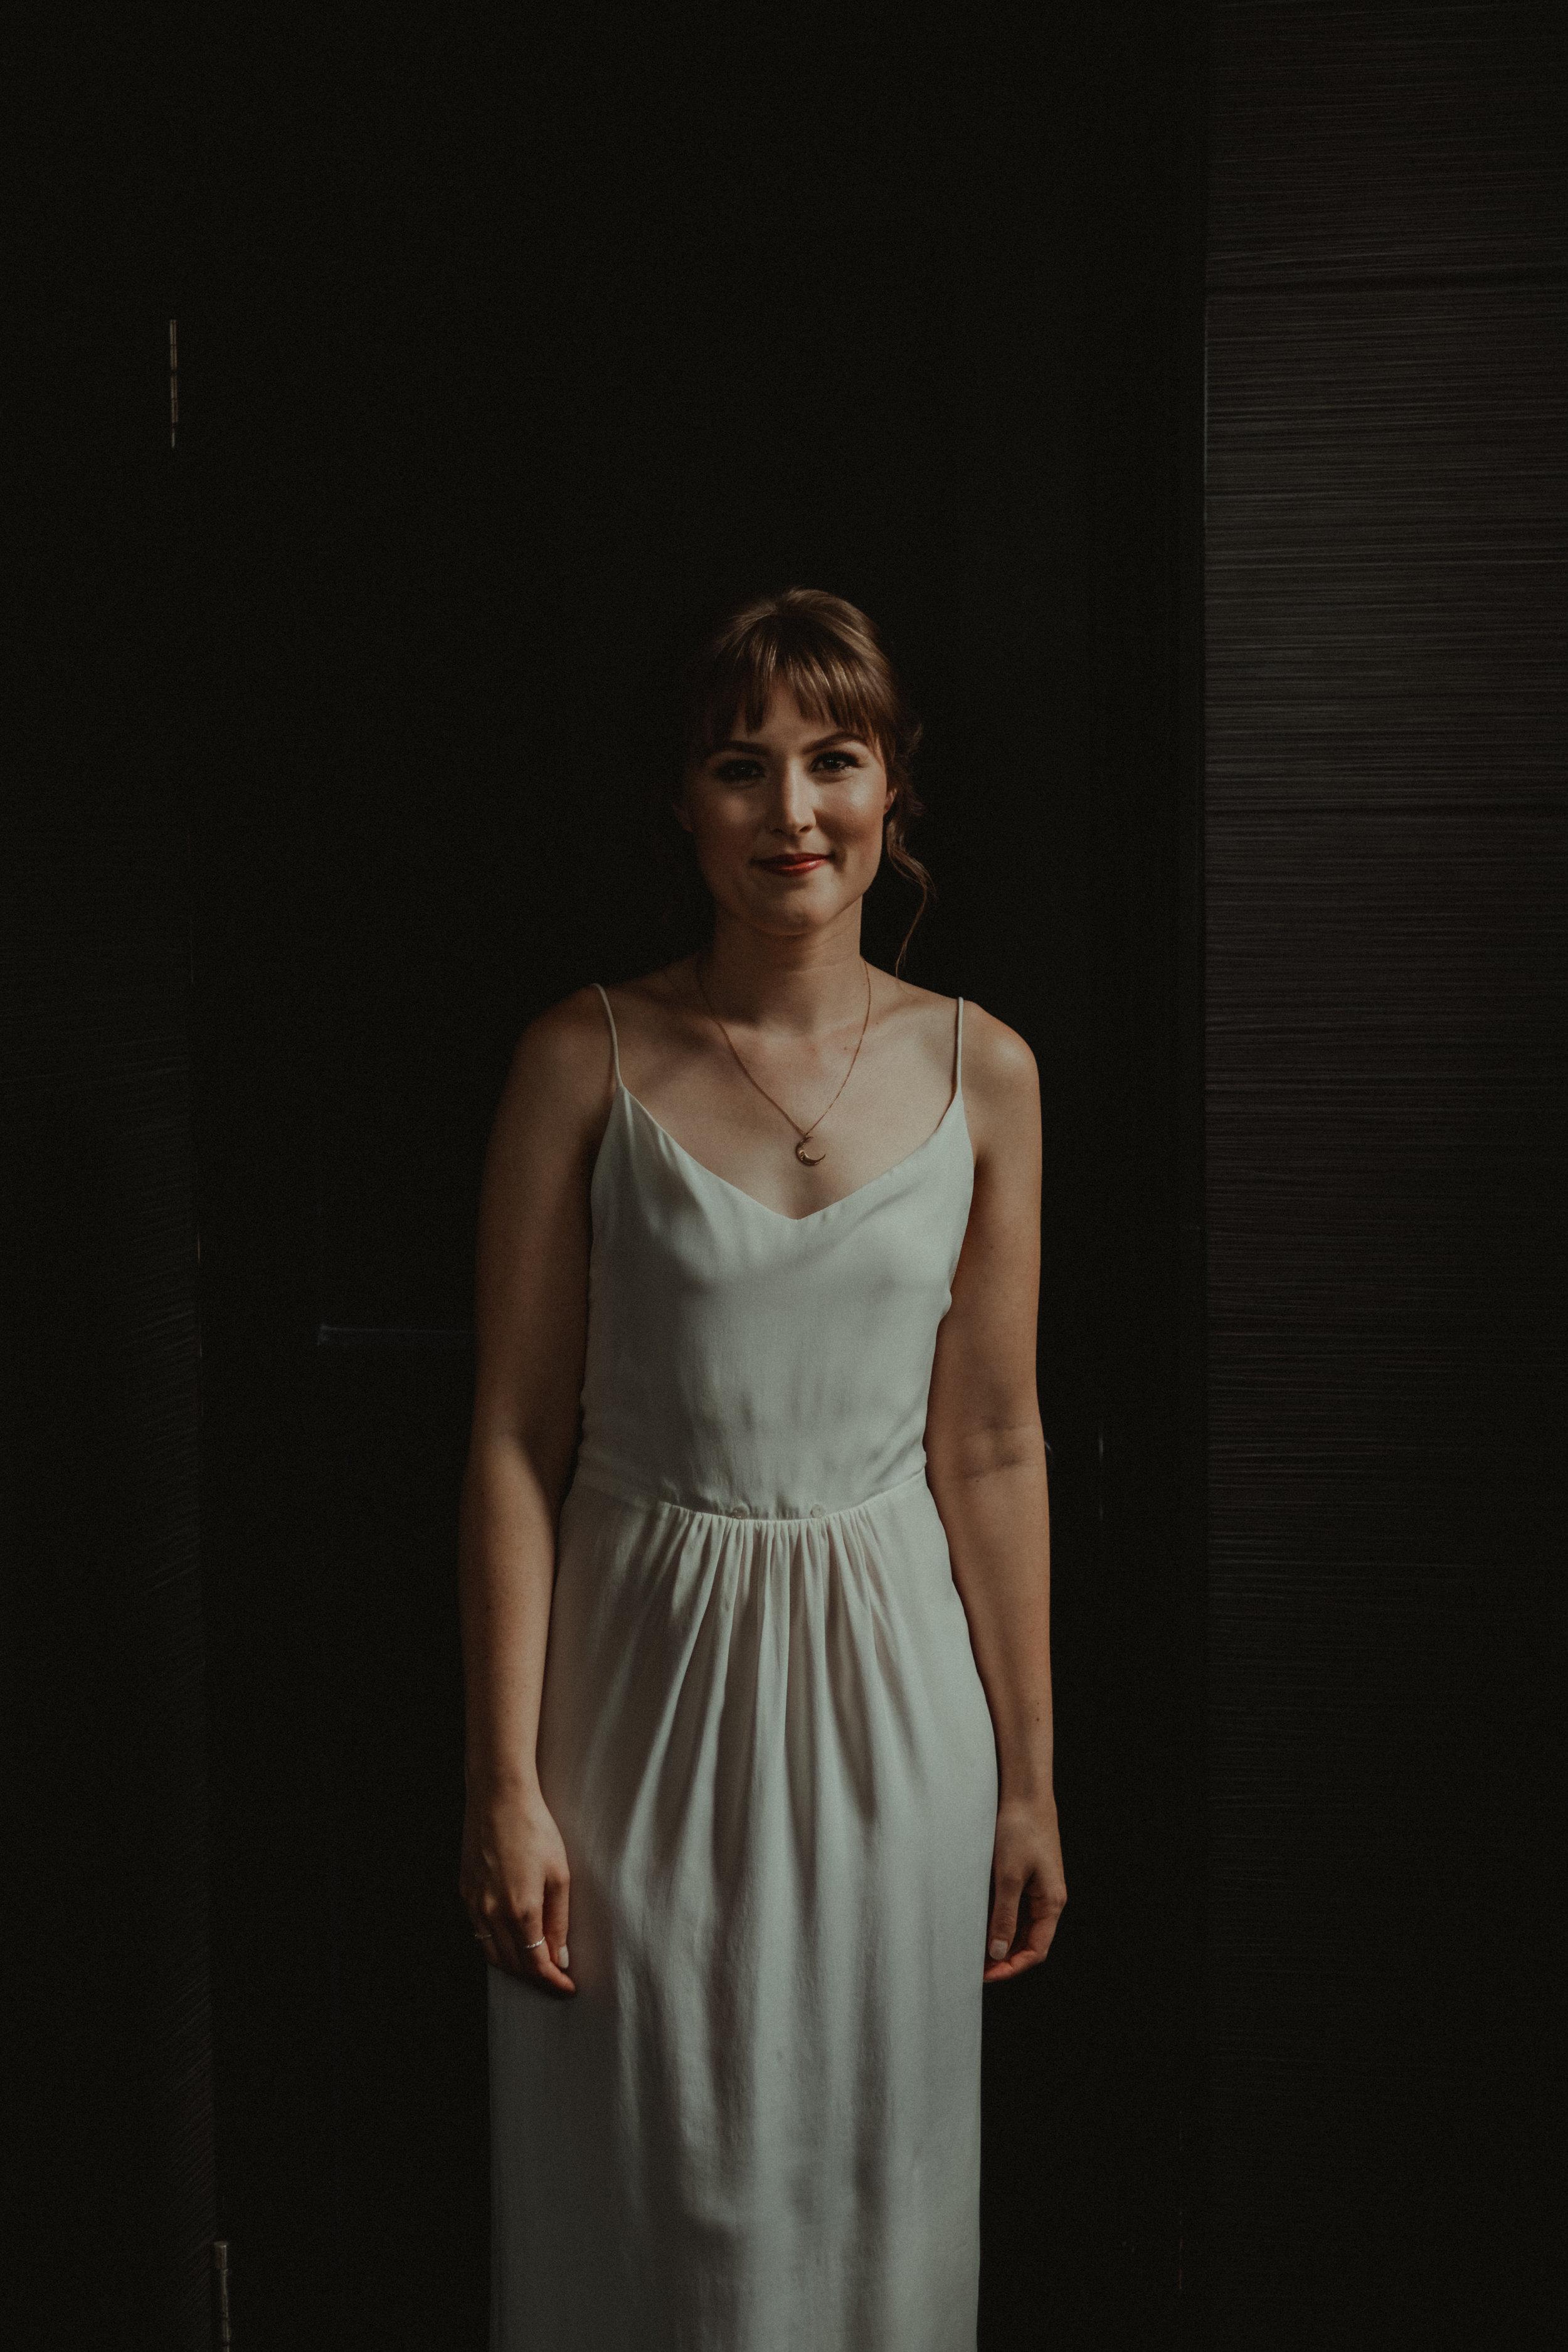 Leanne-London-Bespoke-Backless-Slip-Susanna-Greening-Designs-Matlock-Derbyshire-Wedding-Dress-1